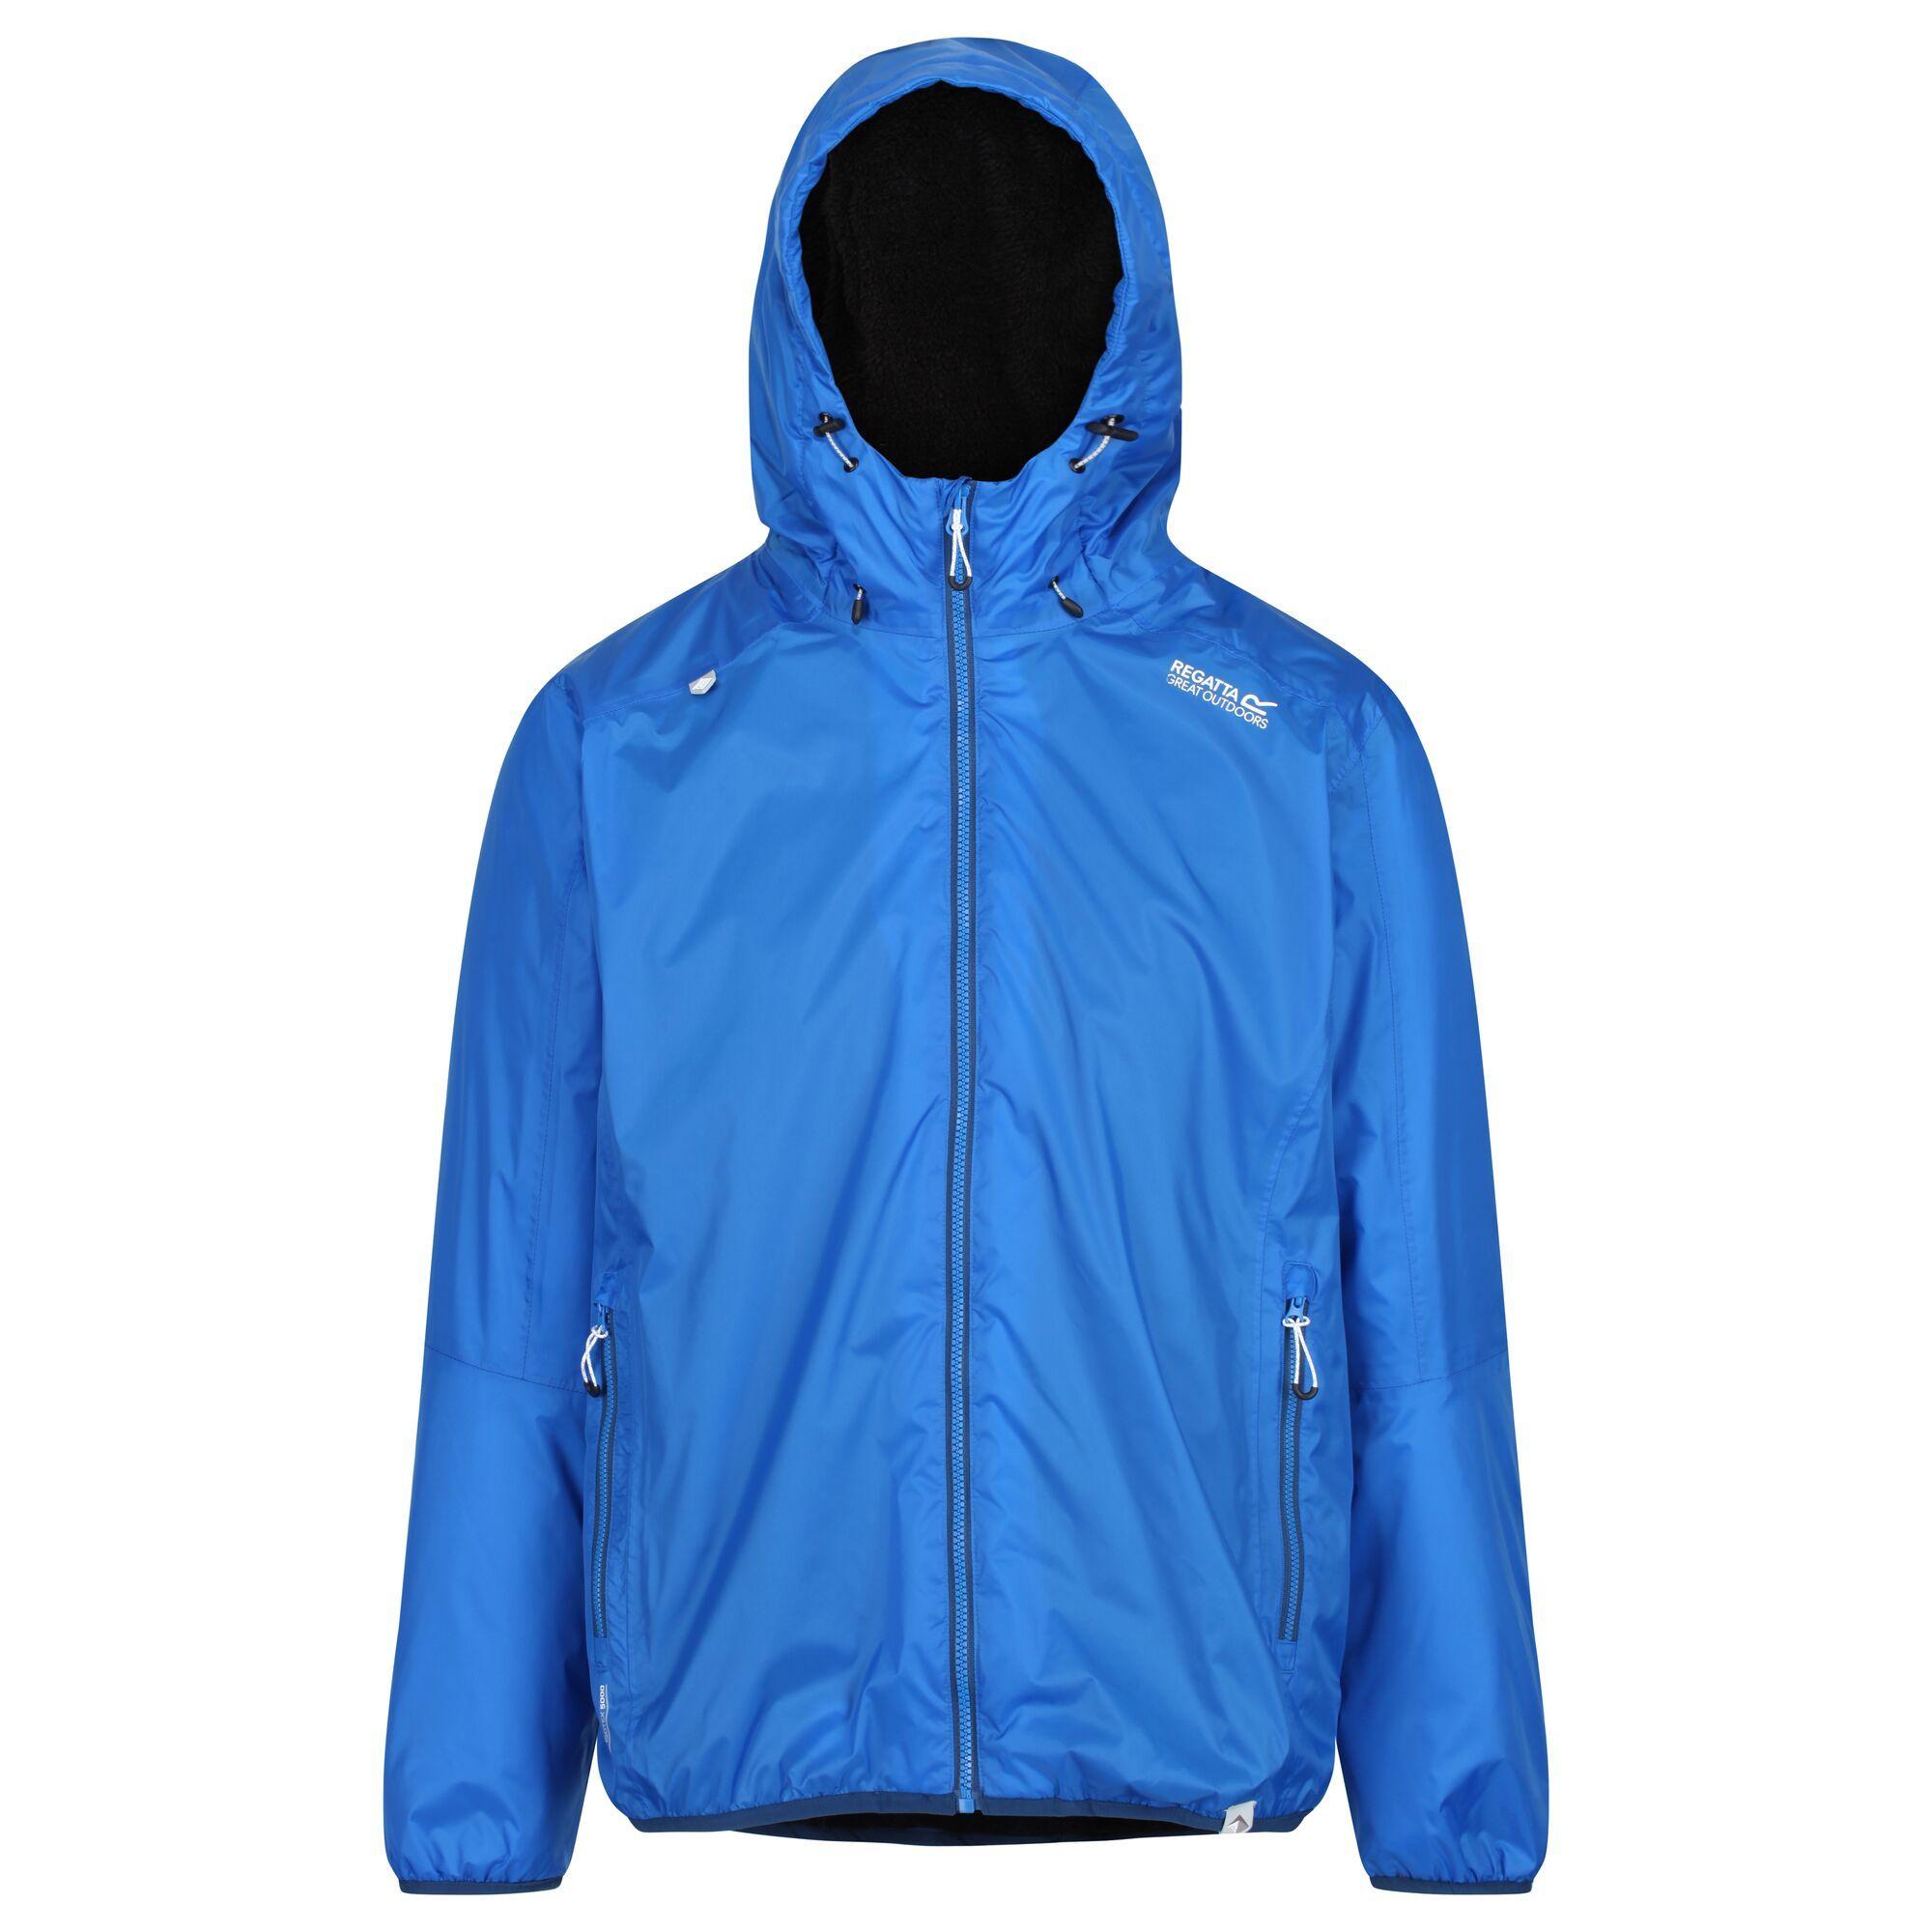 Regatta-Tarren-Mens-Wateproof-Breathable-Fleece-Lined-Jacket-RRP-70 thumbnail 8